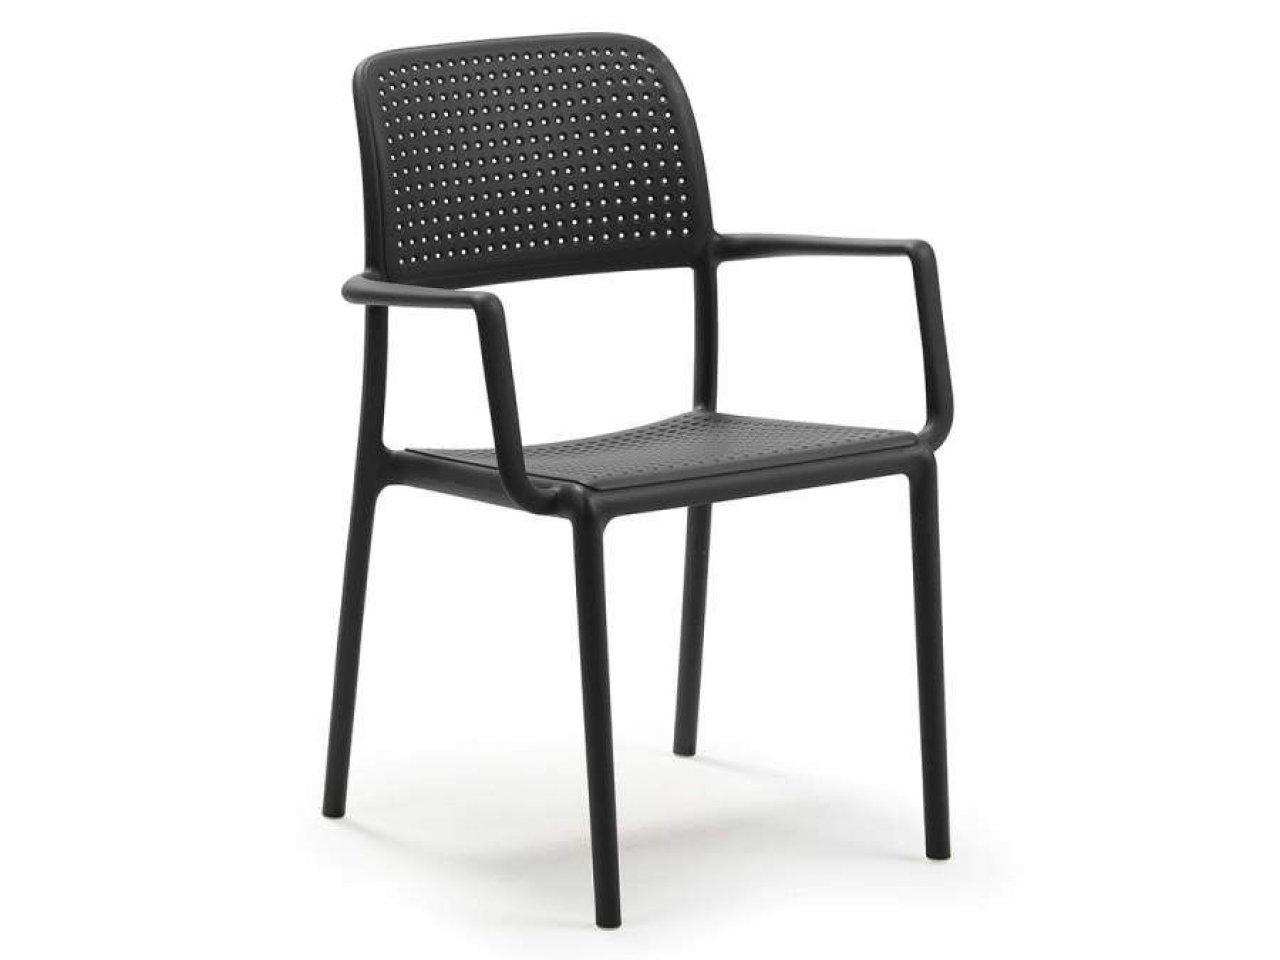 Sedia con braccioli Bora - v7